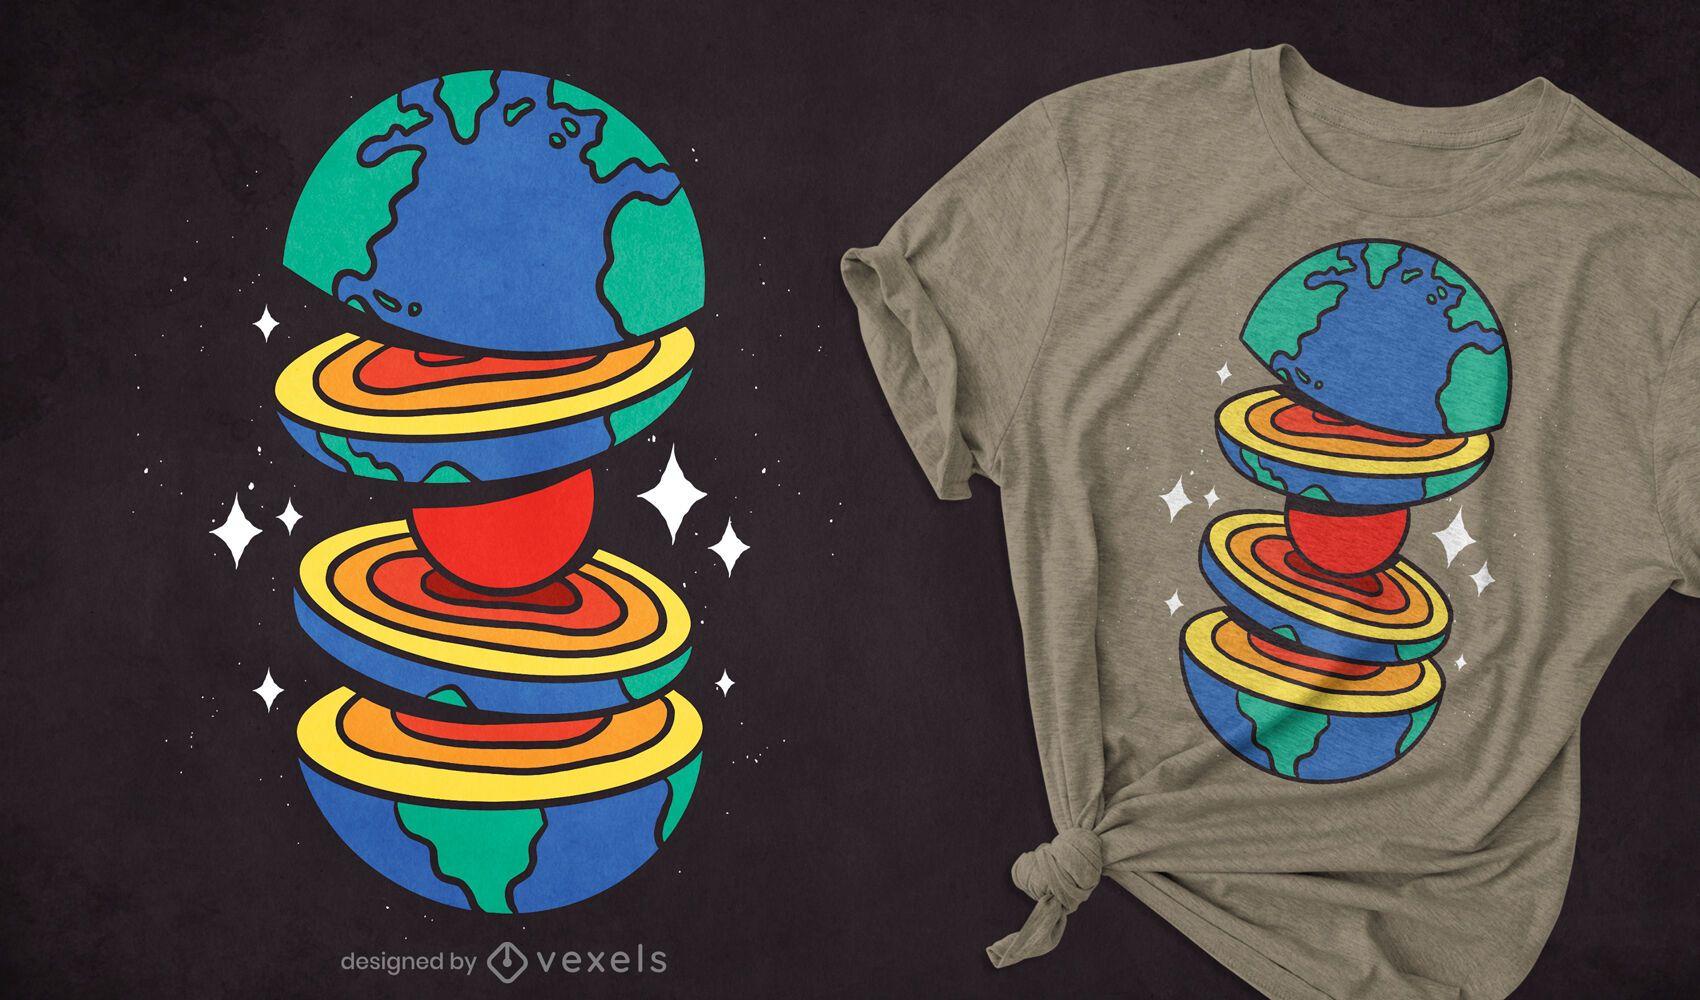 Corte o design de camisetas terrestres